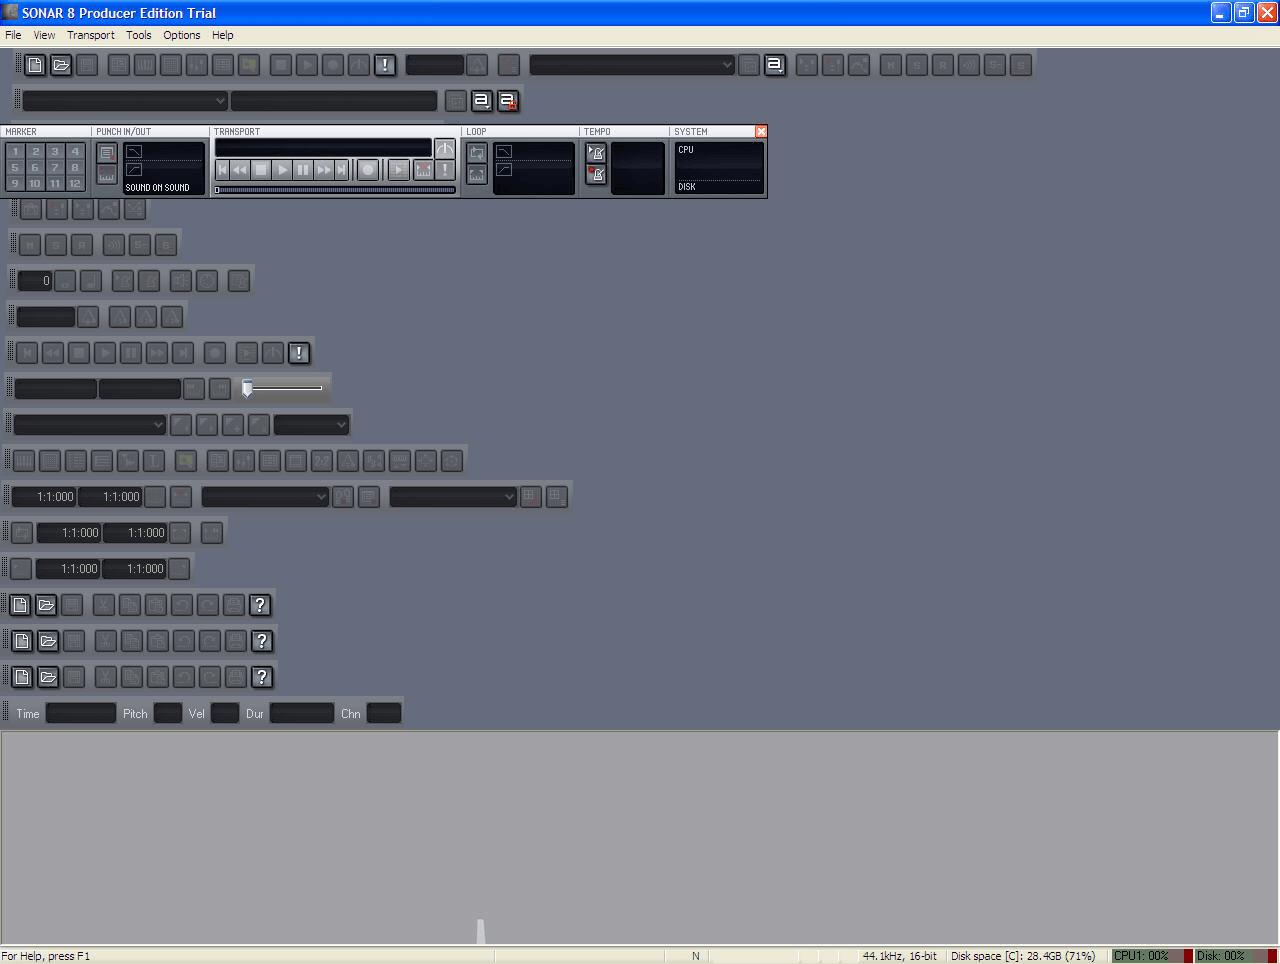 Sonar Main panel